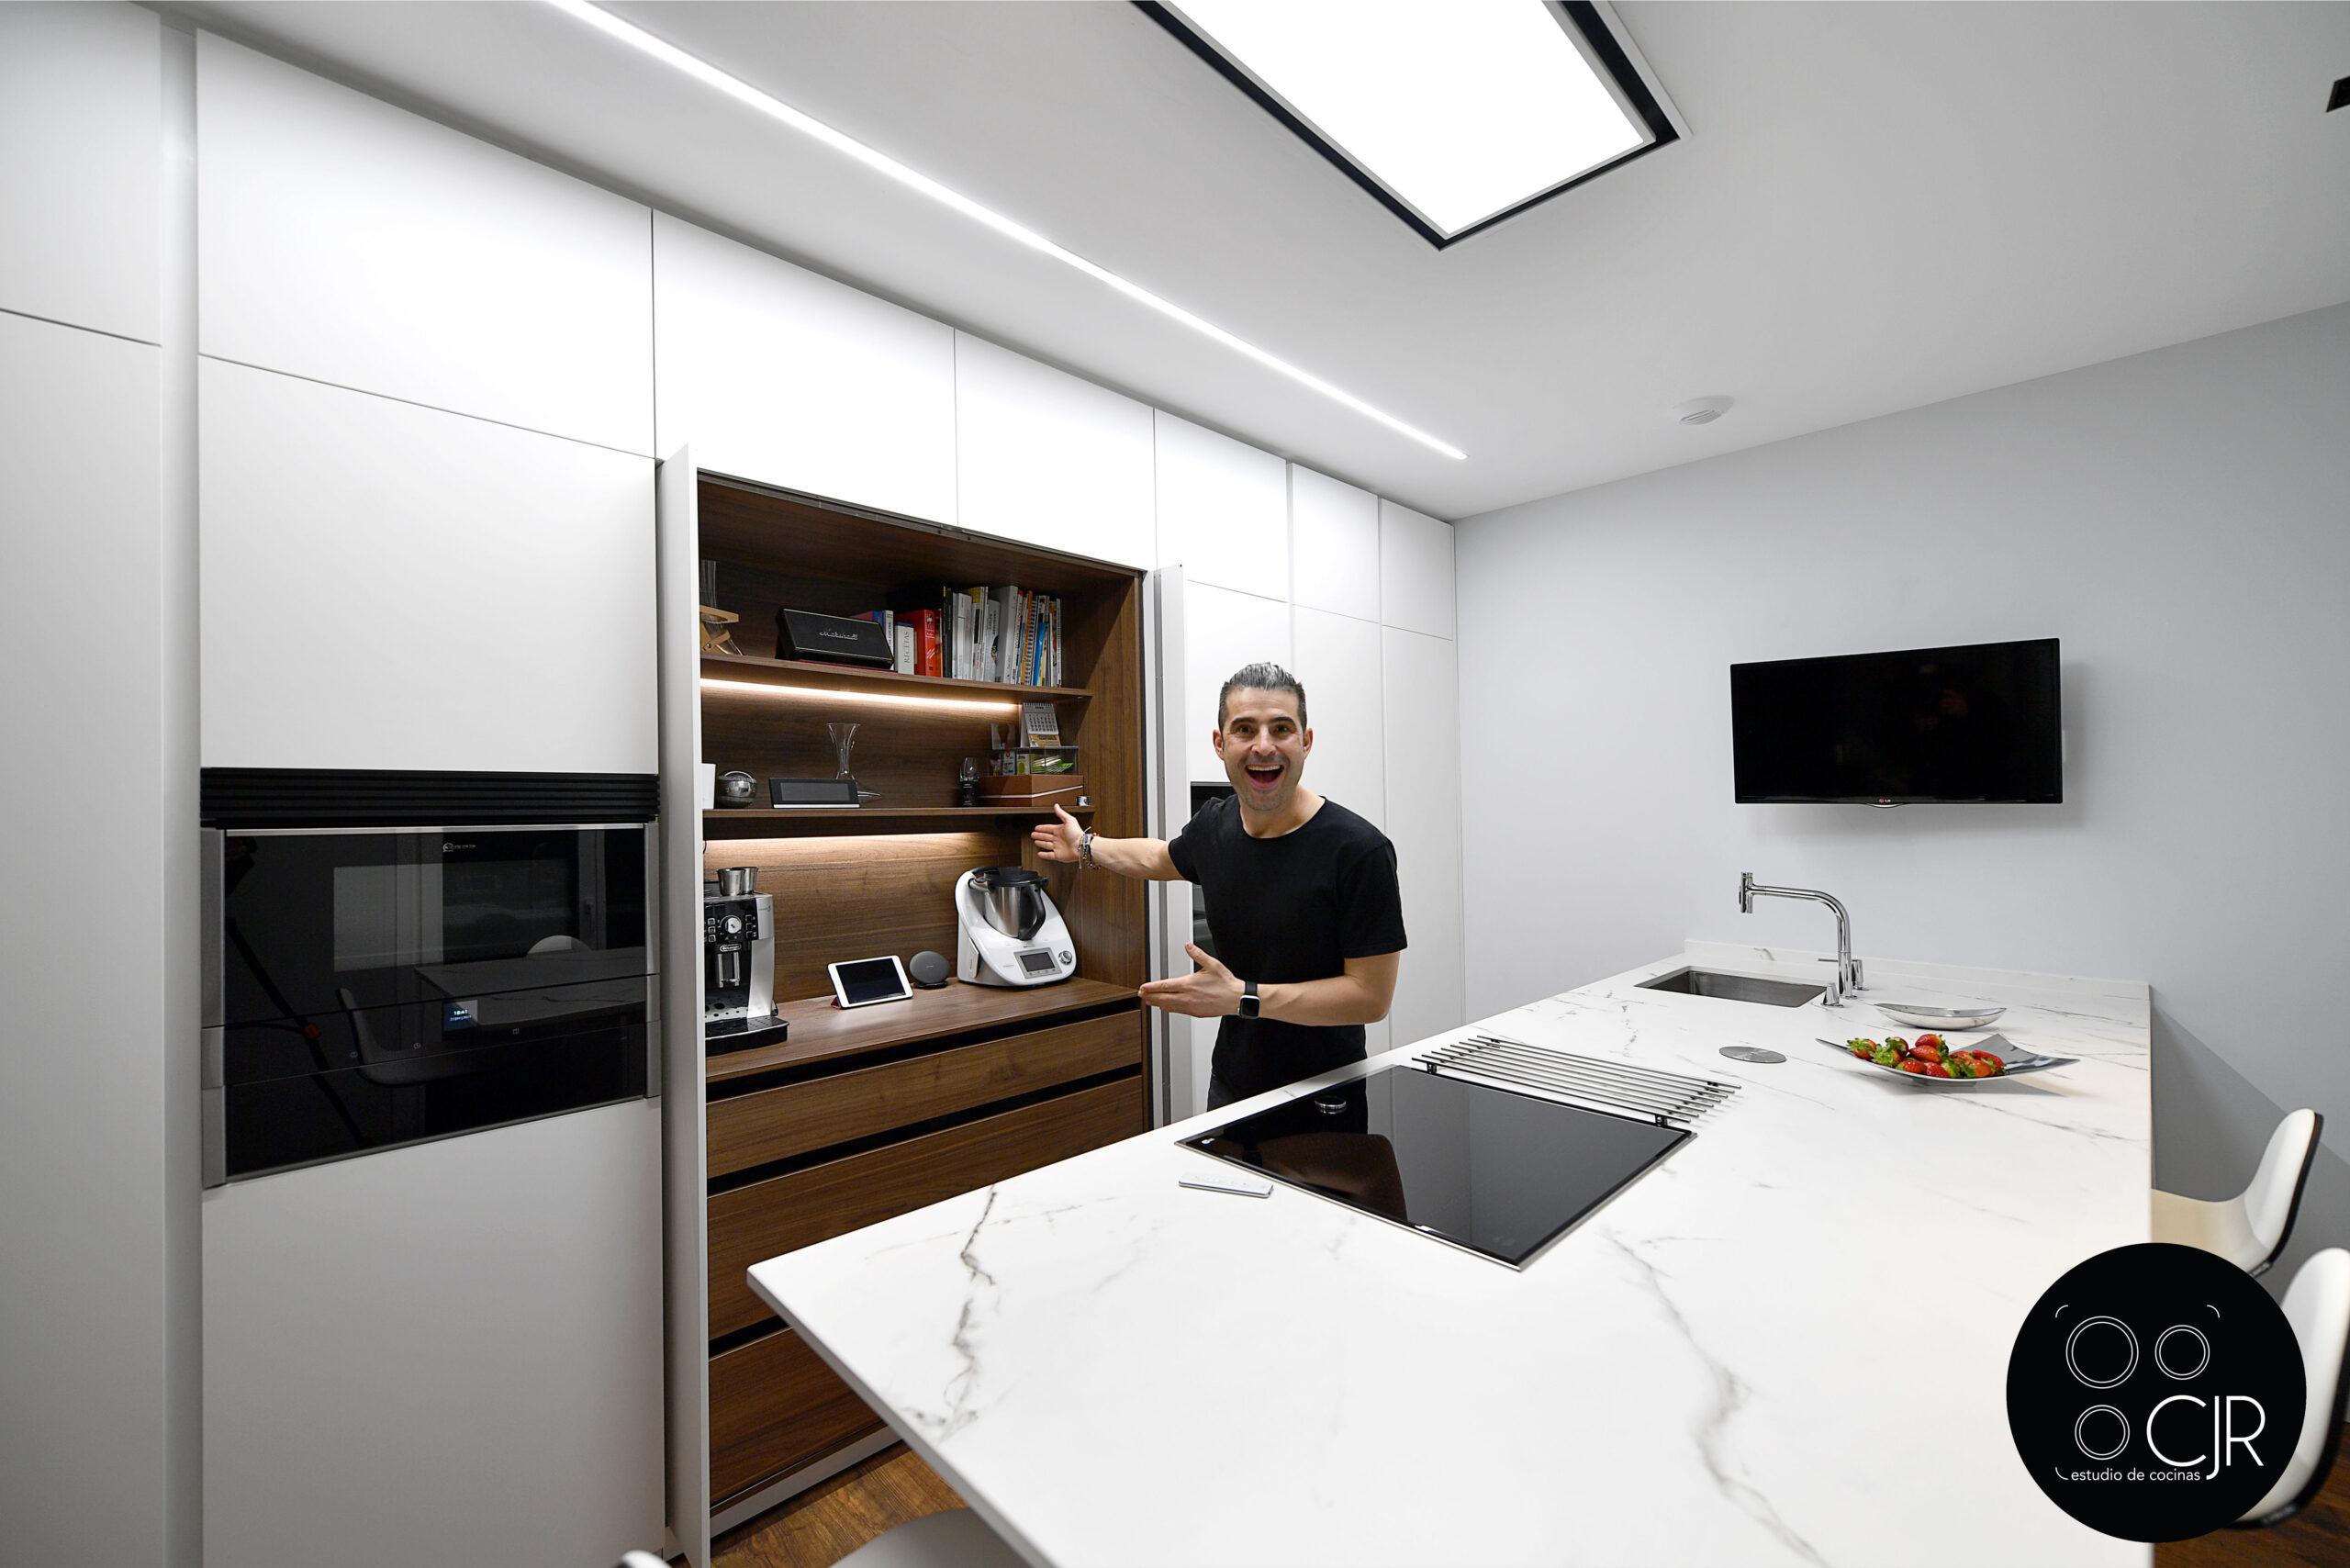 Presentación de la cocina blanca mate sin tiradores